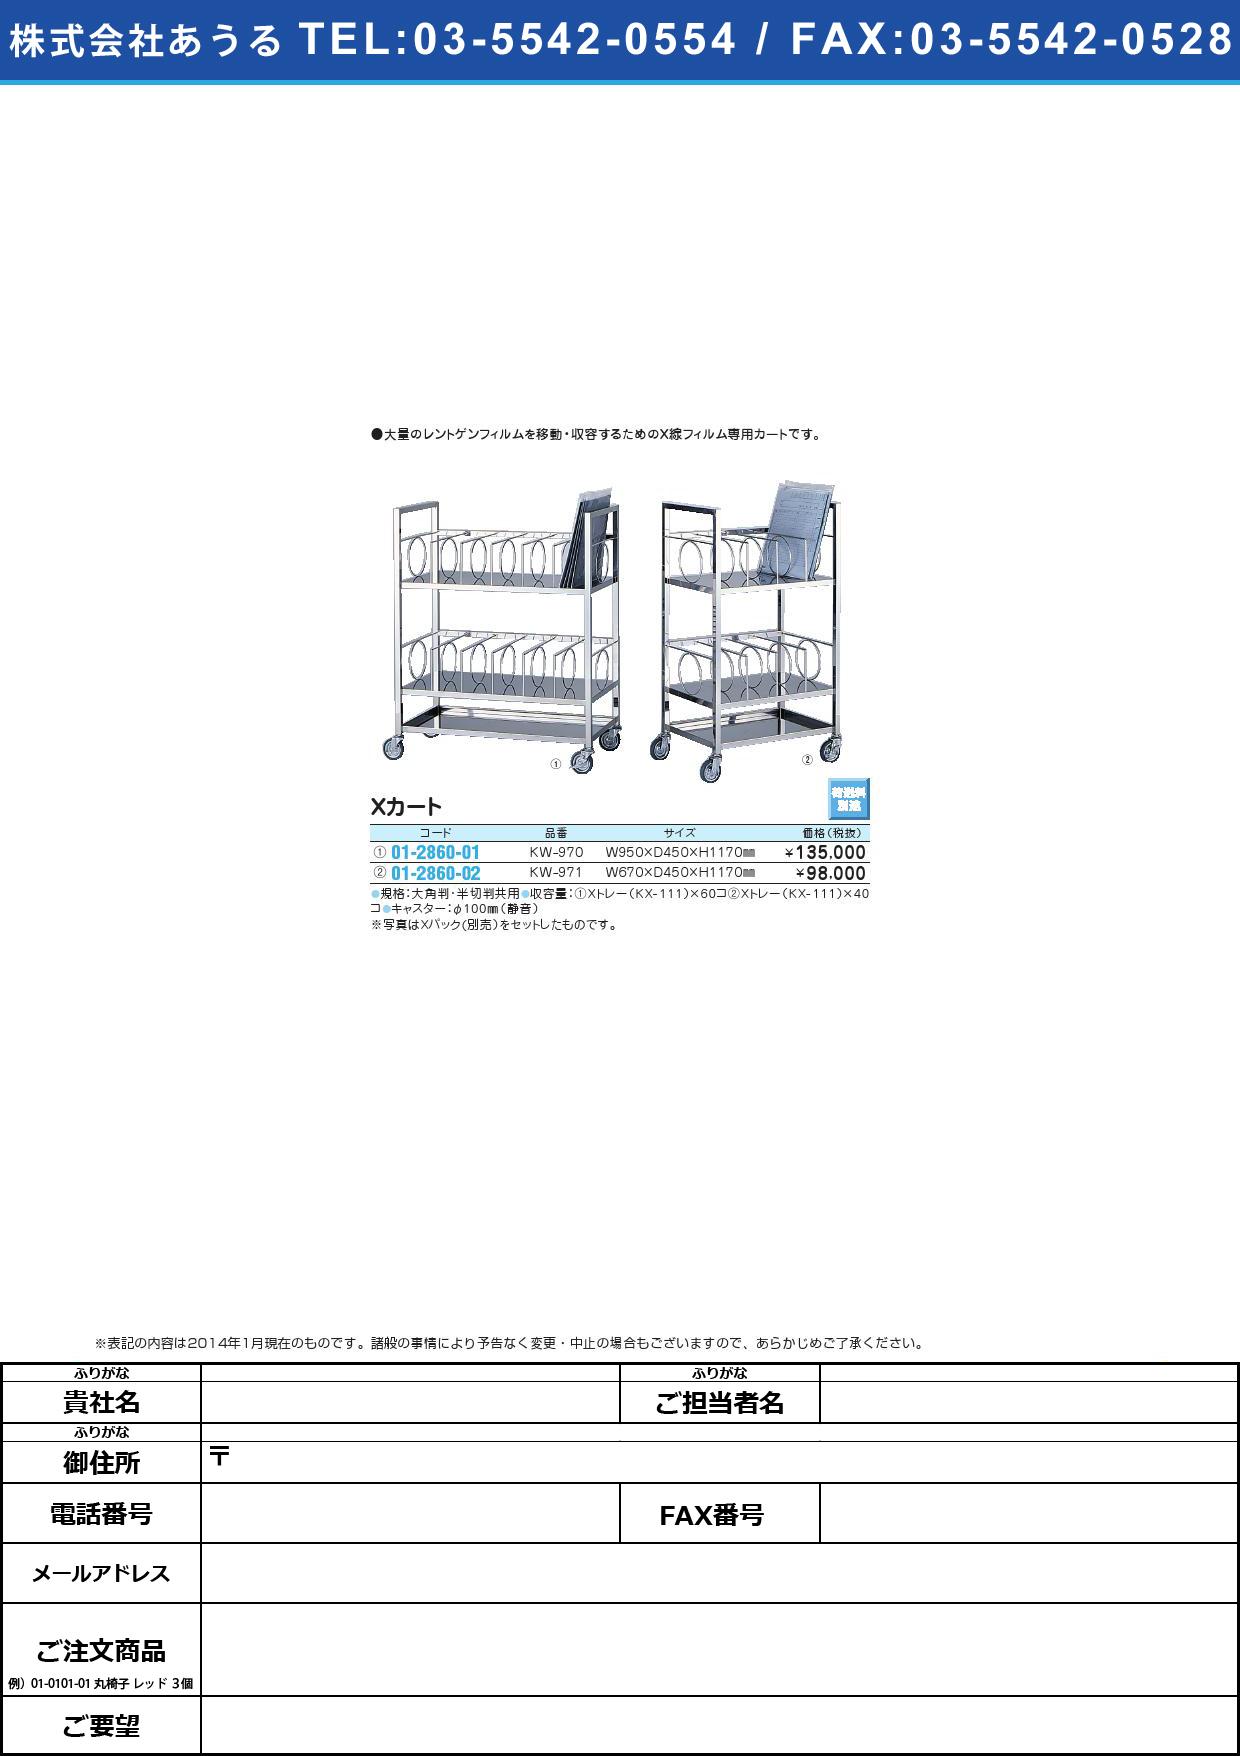 (01-2860-01)Xカート KW970(01-2860-01)KW-970【1台単位】【2014年カタログ商品】